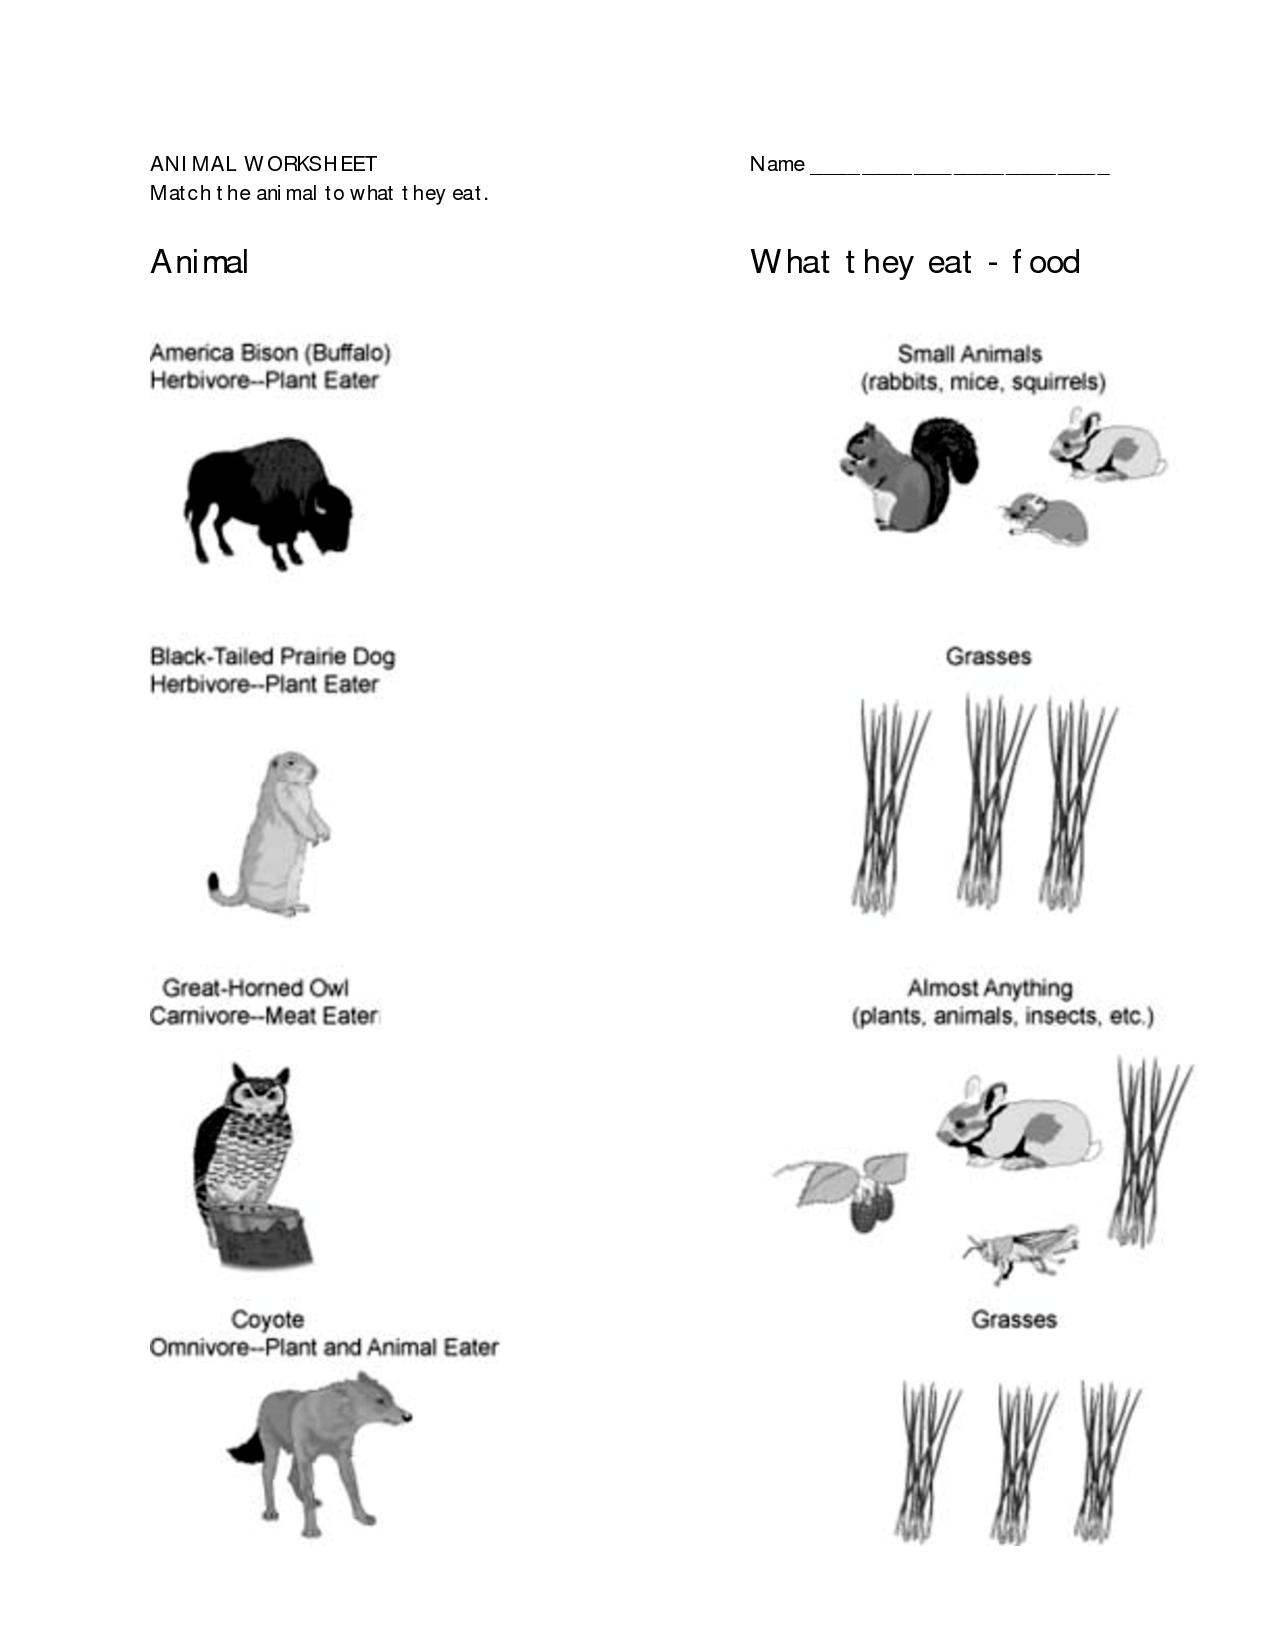 Worksheets For 1st Grade E Worksheets For 1st Grade